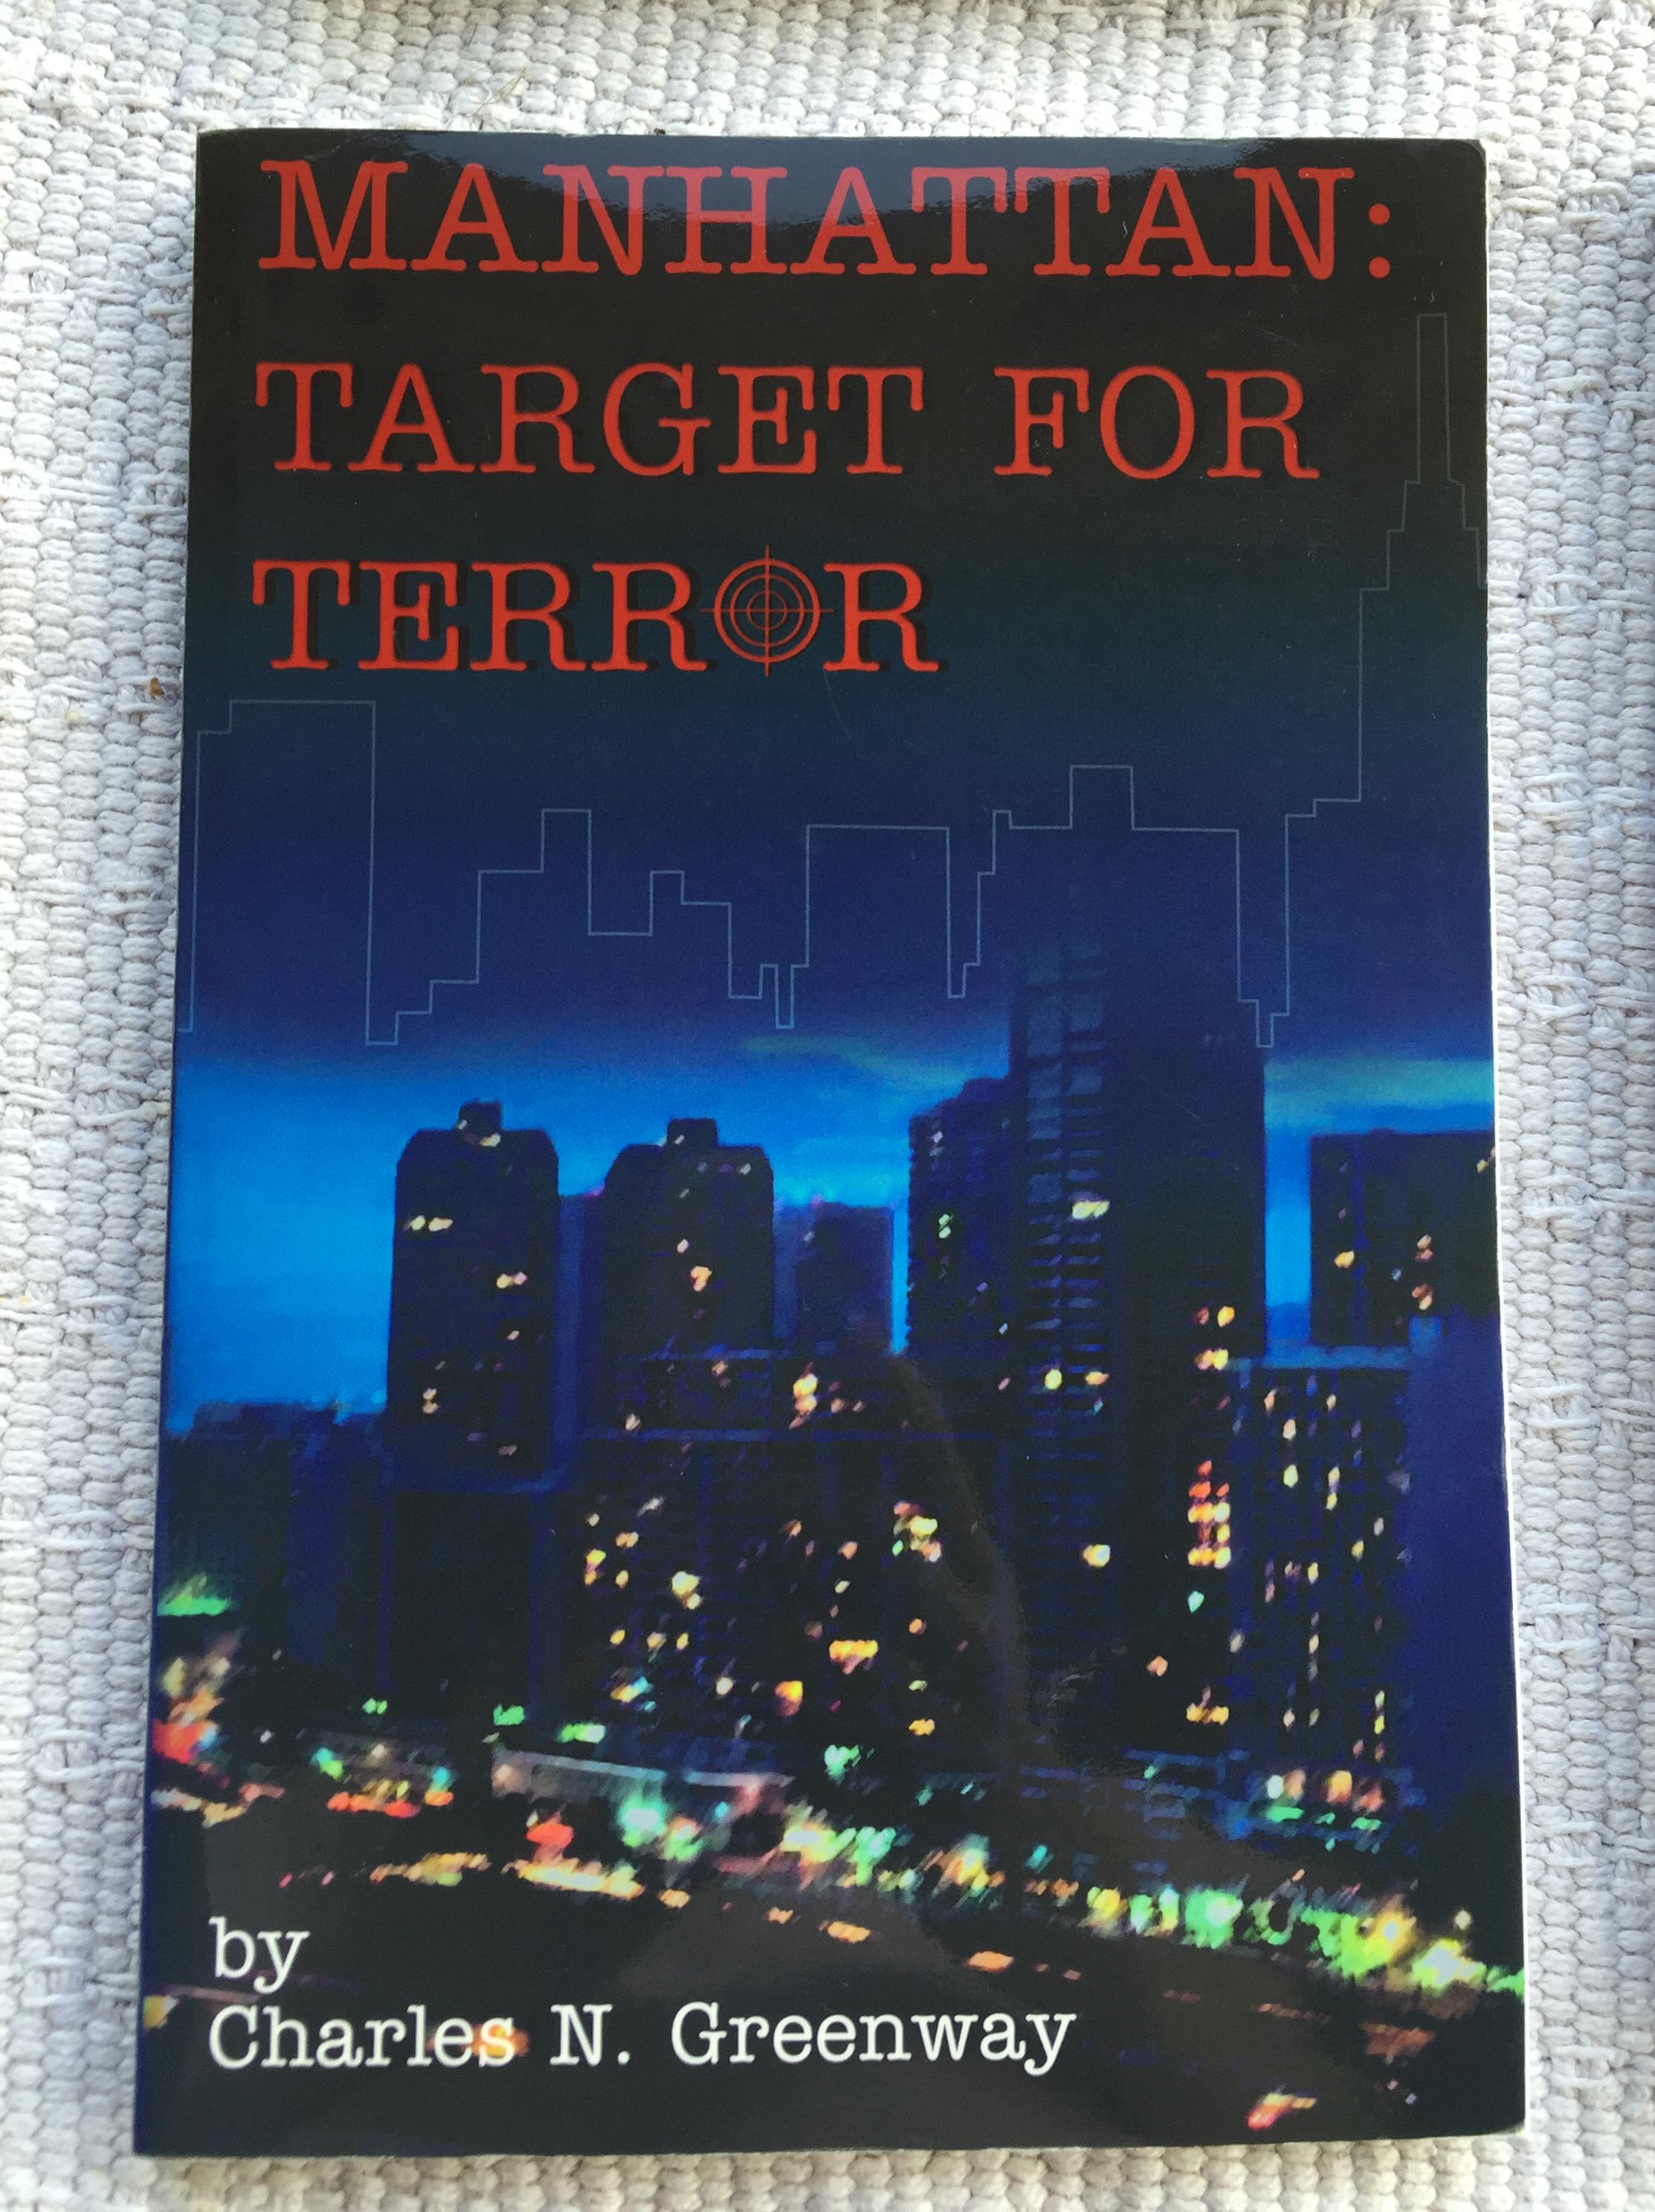 Manhatten-Terror Cover.jpg